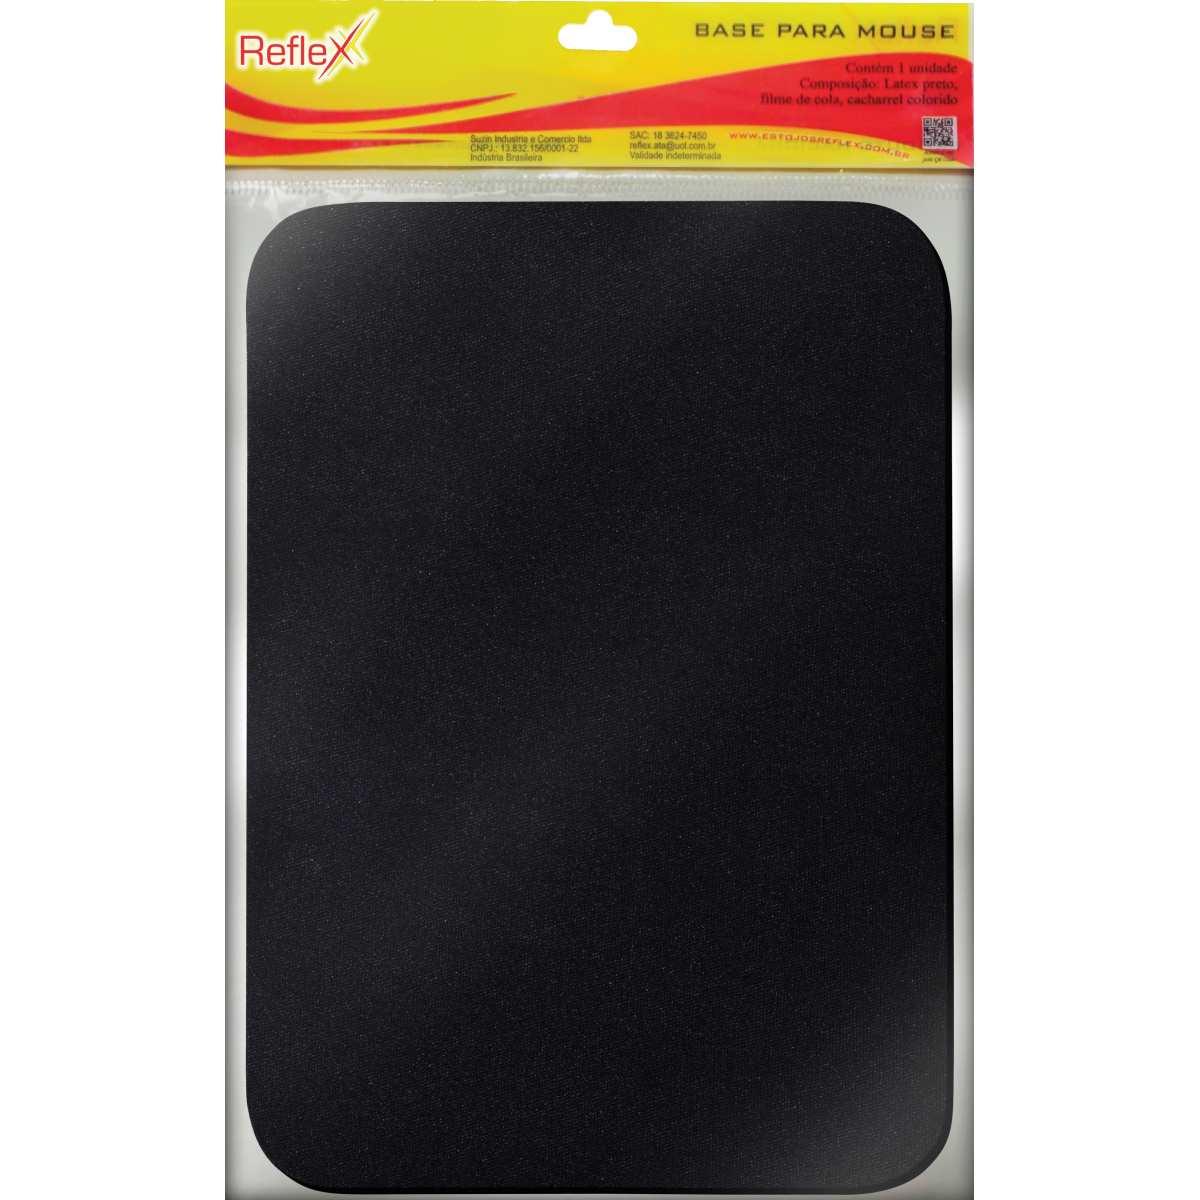 Mouse Pad - Tecido Preto Emborrachado - Reflex